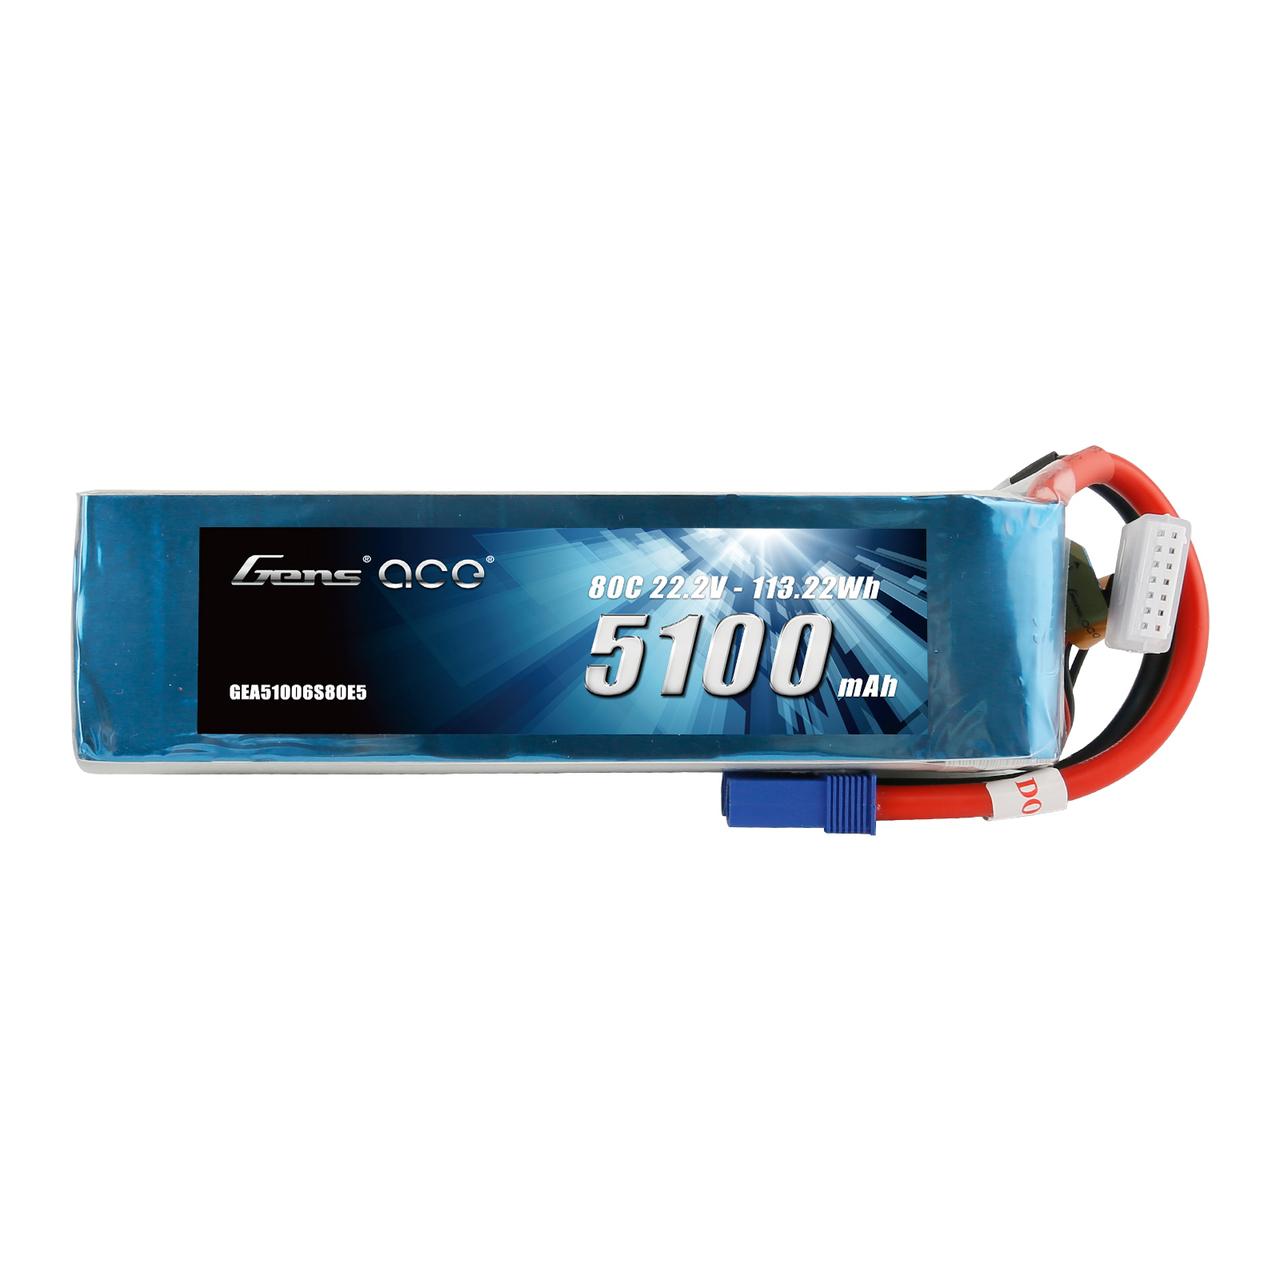 Gens ace 22.2V 80C 6S 5100mah Lipo Battery Pack with EC5 Plug